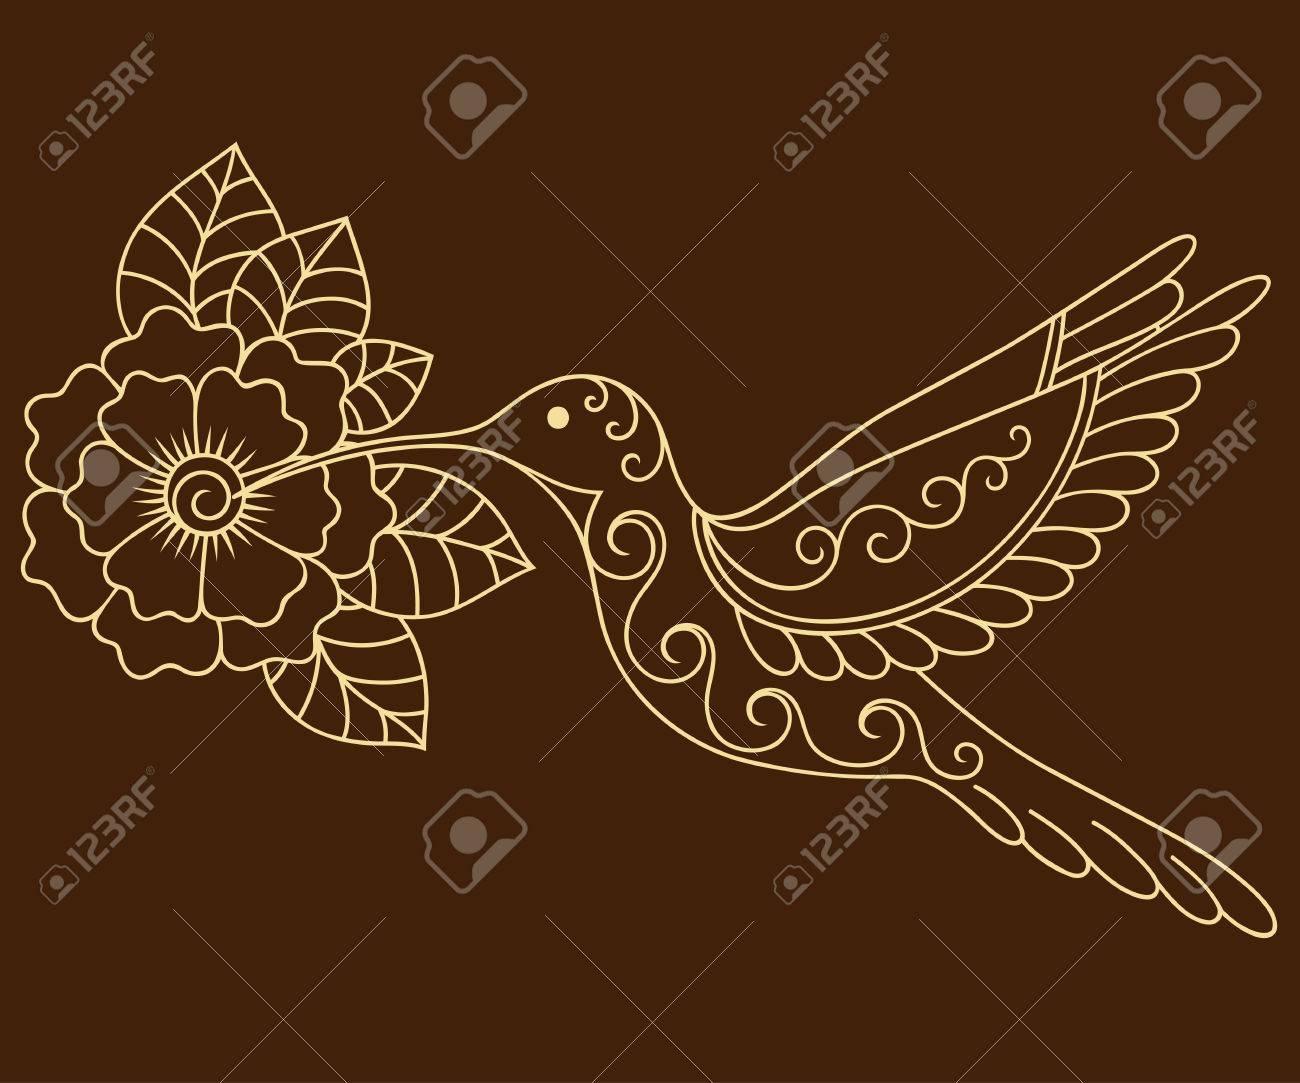 Mehndi Patterns Vector : Henna tattoo flower and colibri template mehndi style set of